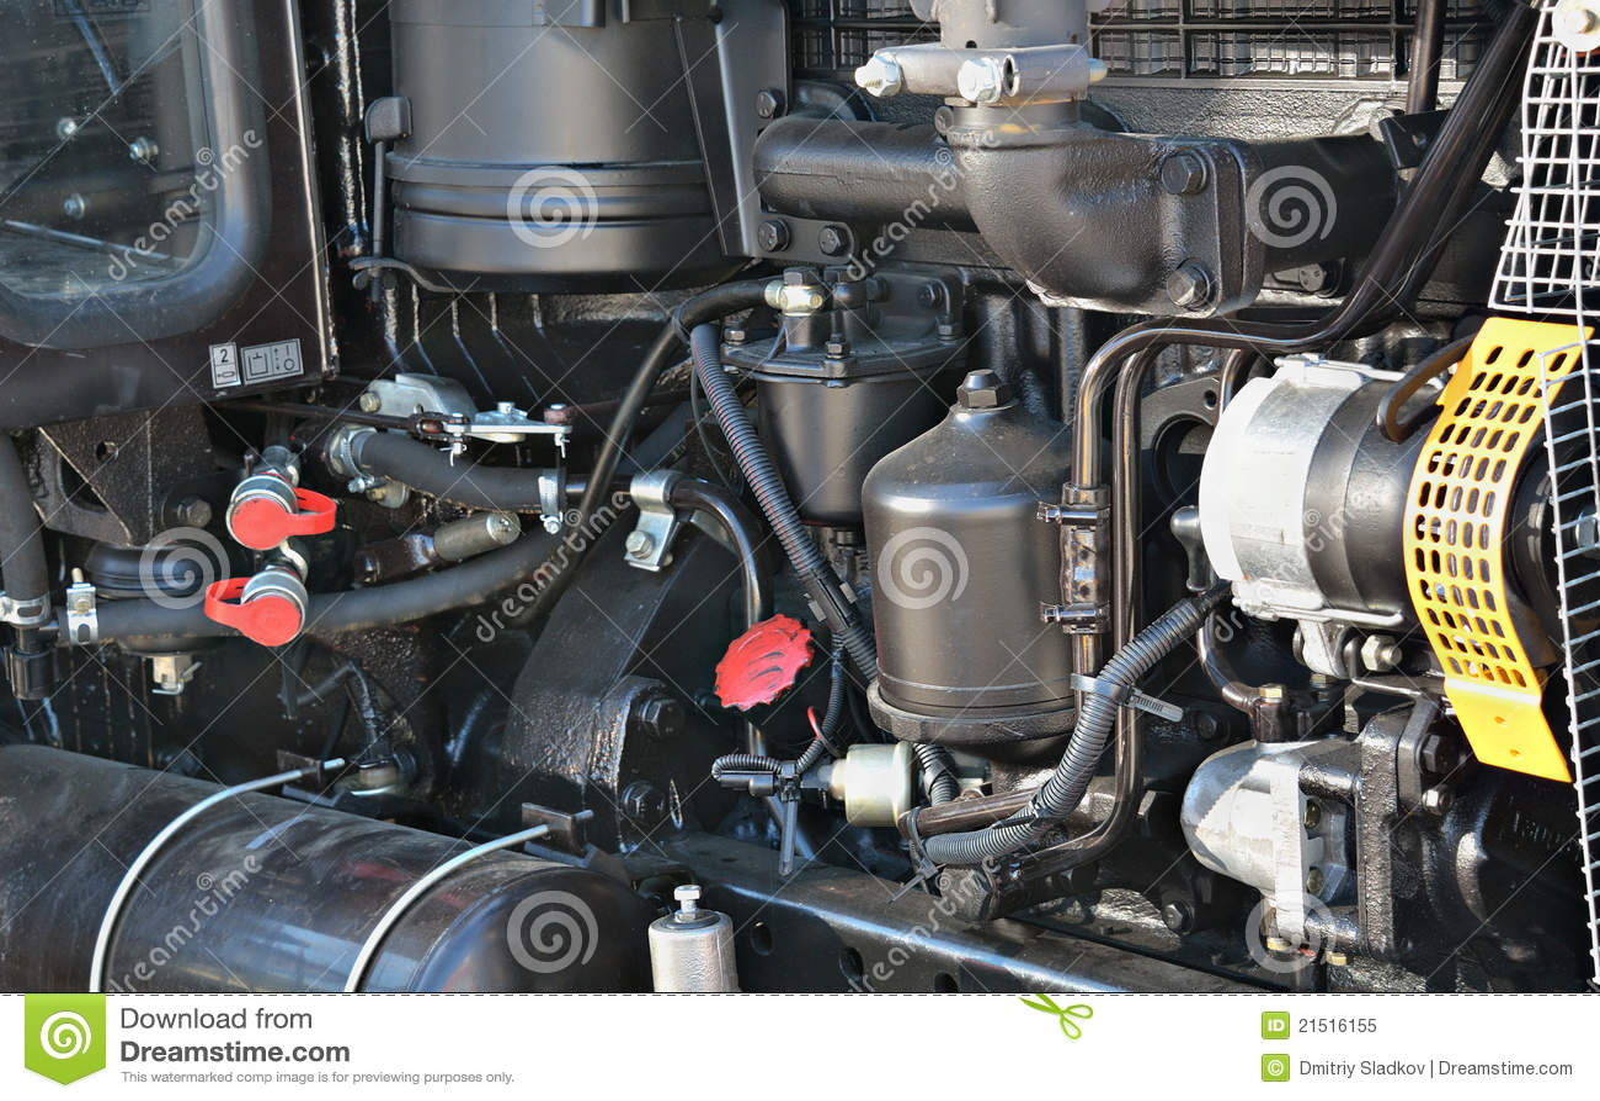 2 Motor Tractor : Tractor motor stock image of vehicle repair